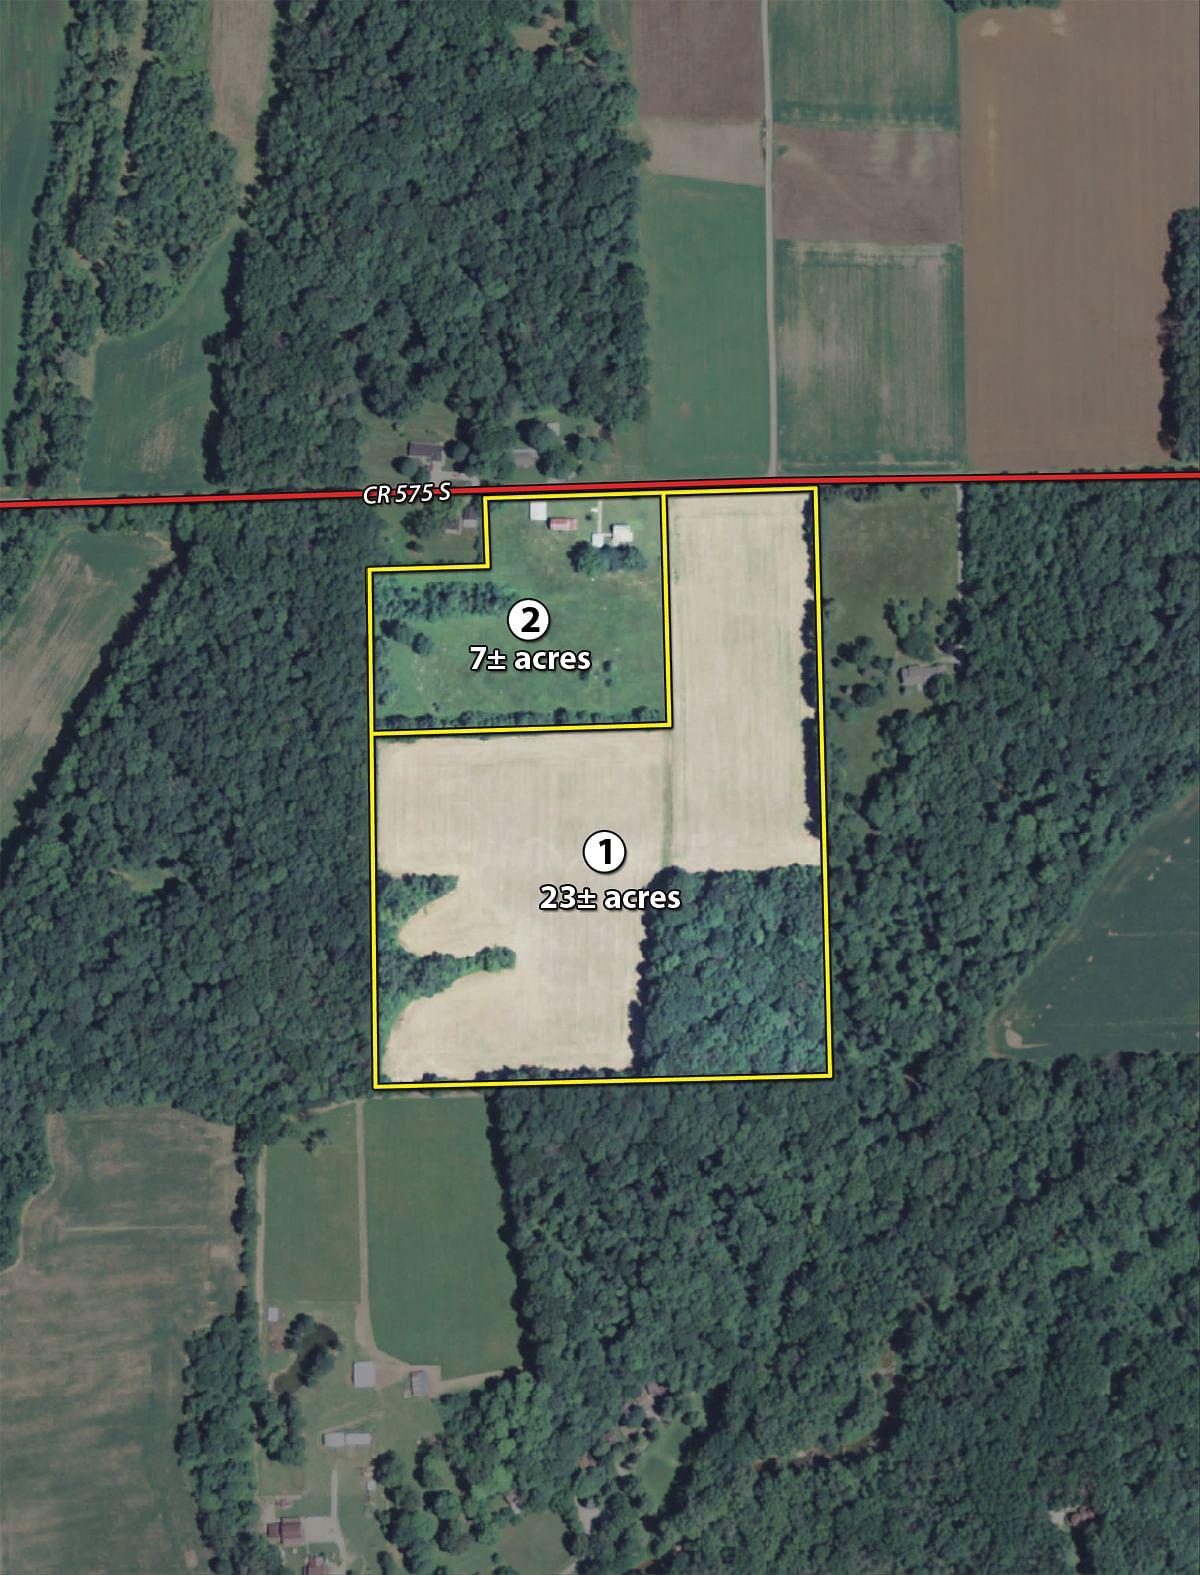 Indiana madison county markleville - Tract Maps